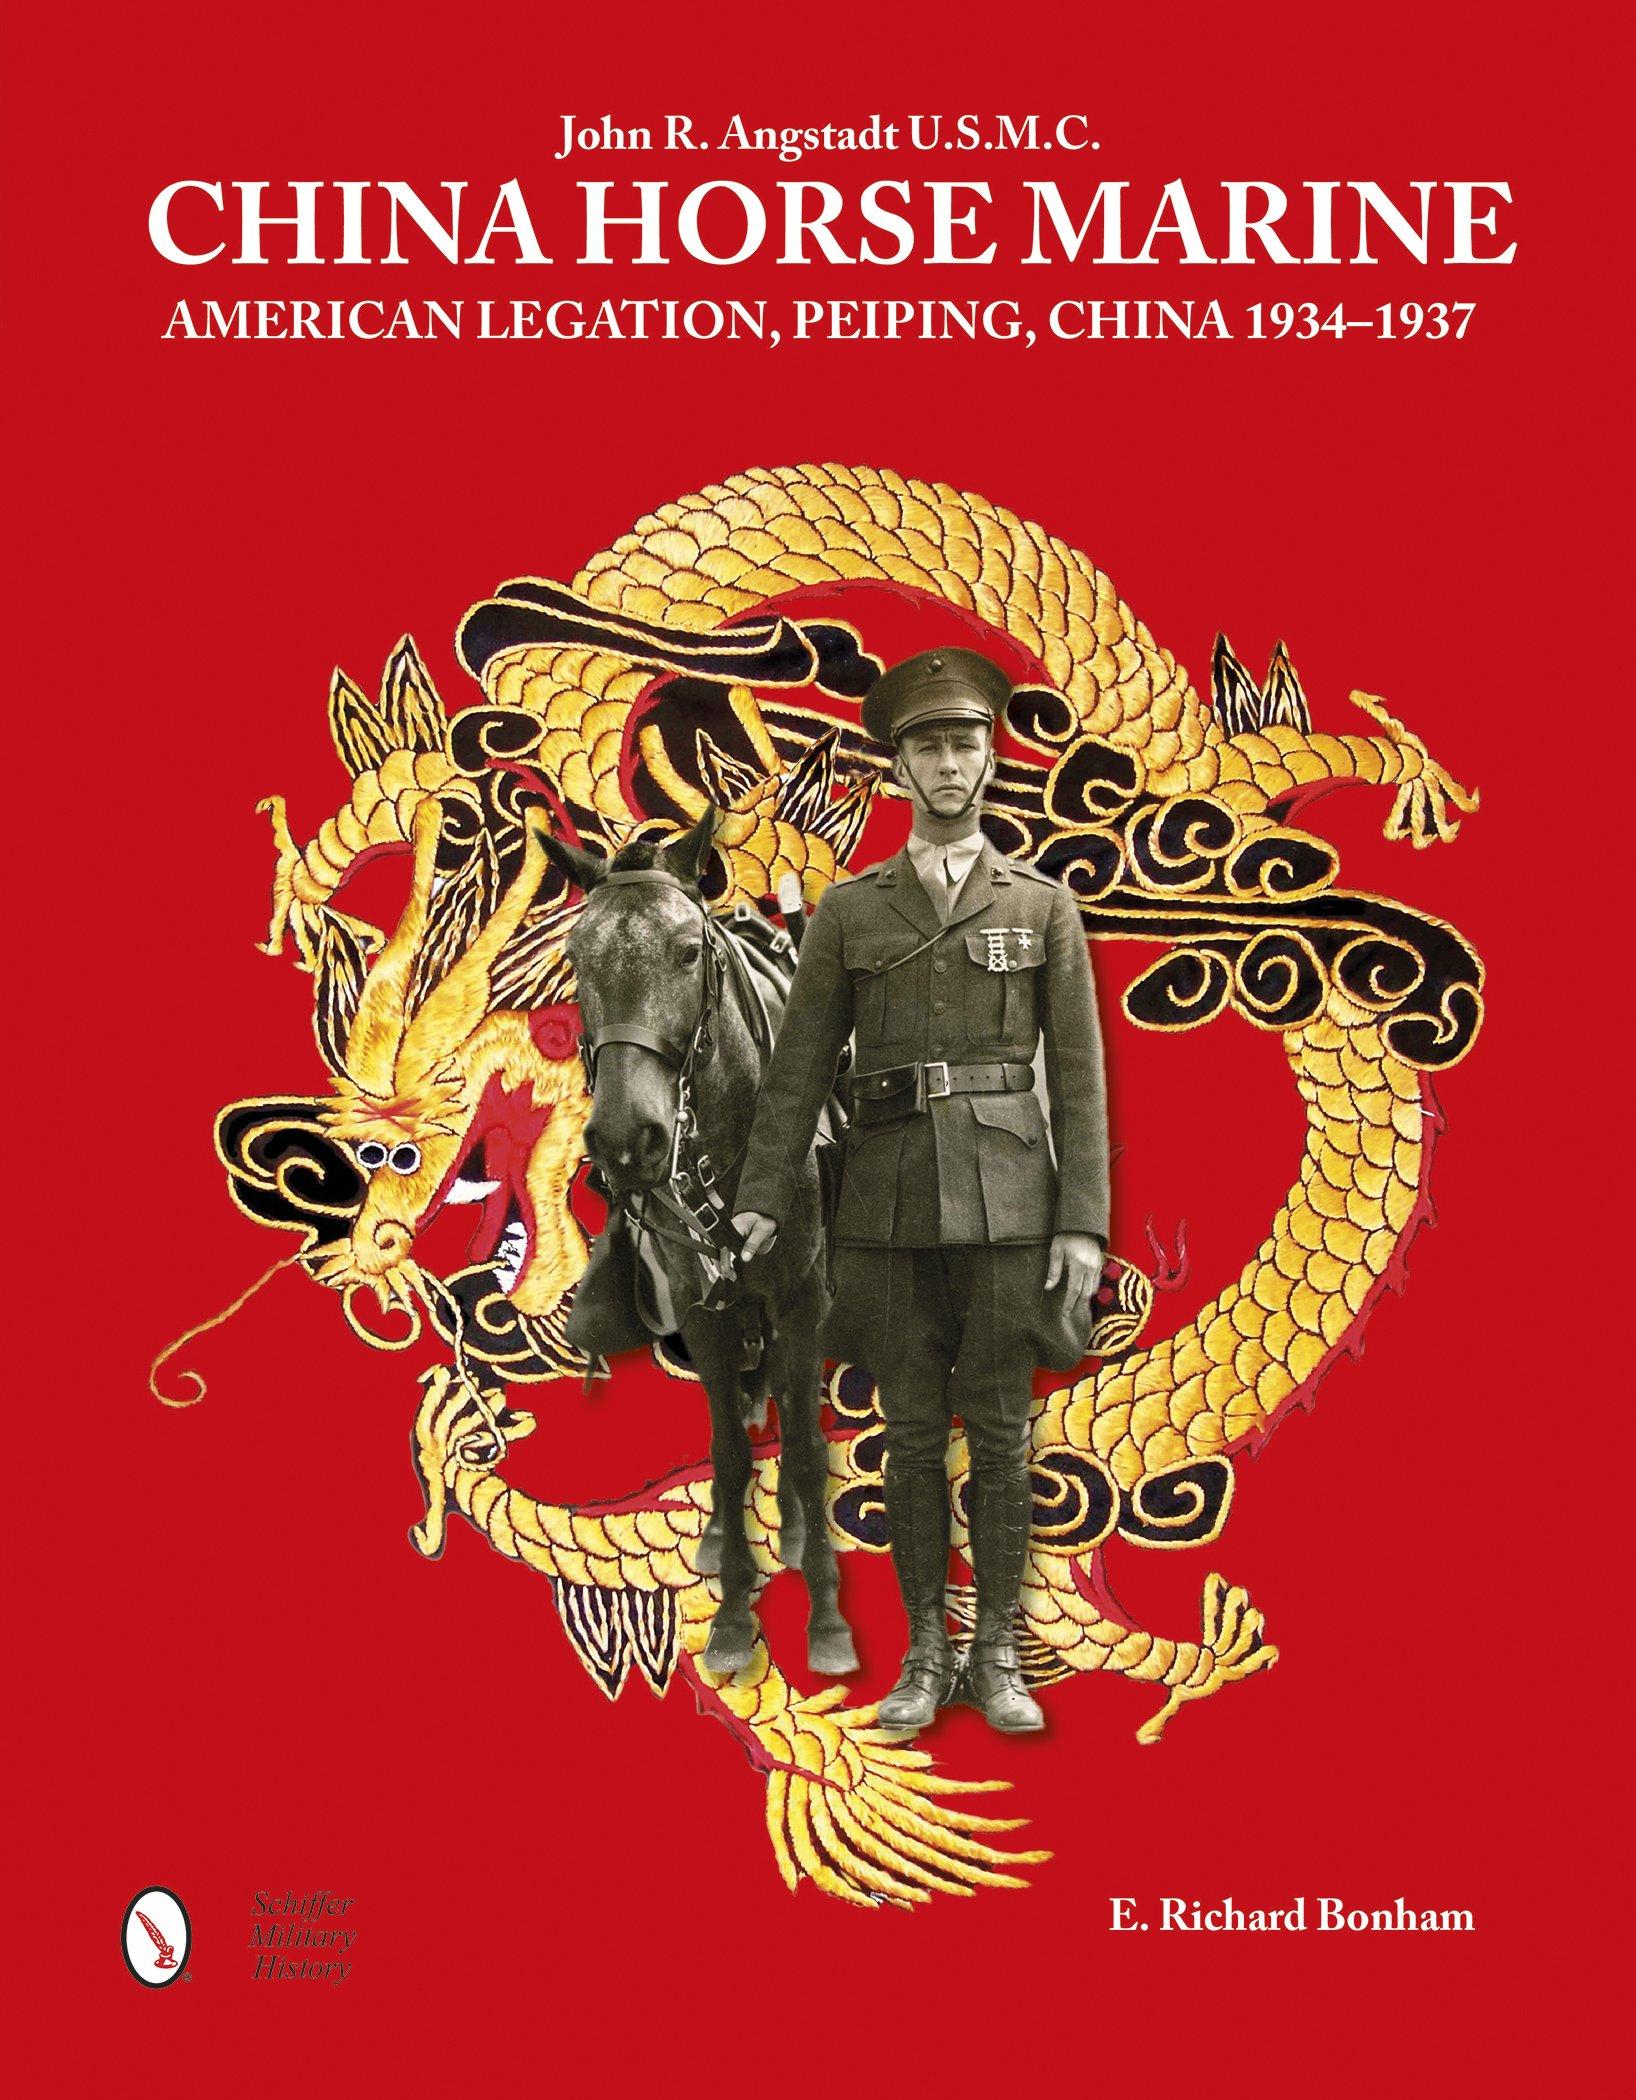 china-horse-marine-john-r-angstadt-u-s-m-c-american-legation-peiping-china-1934-1937